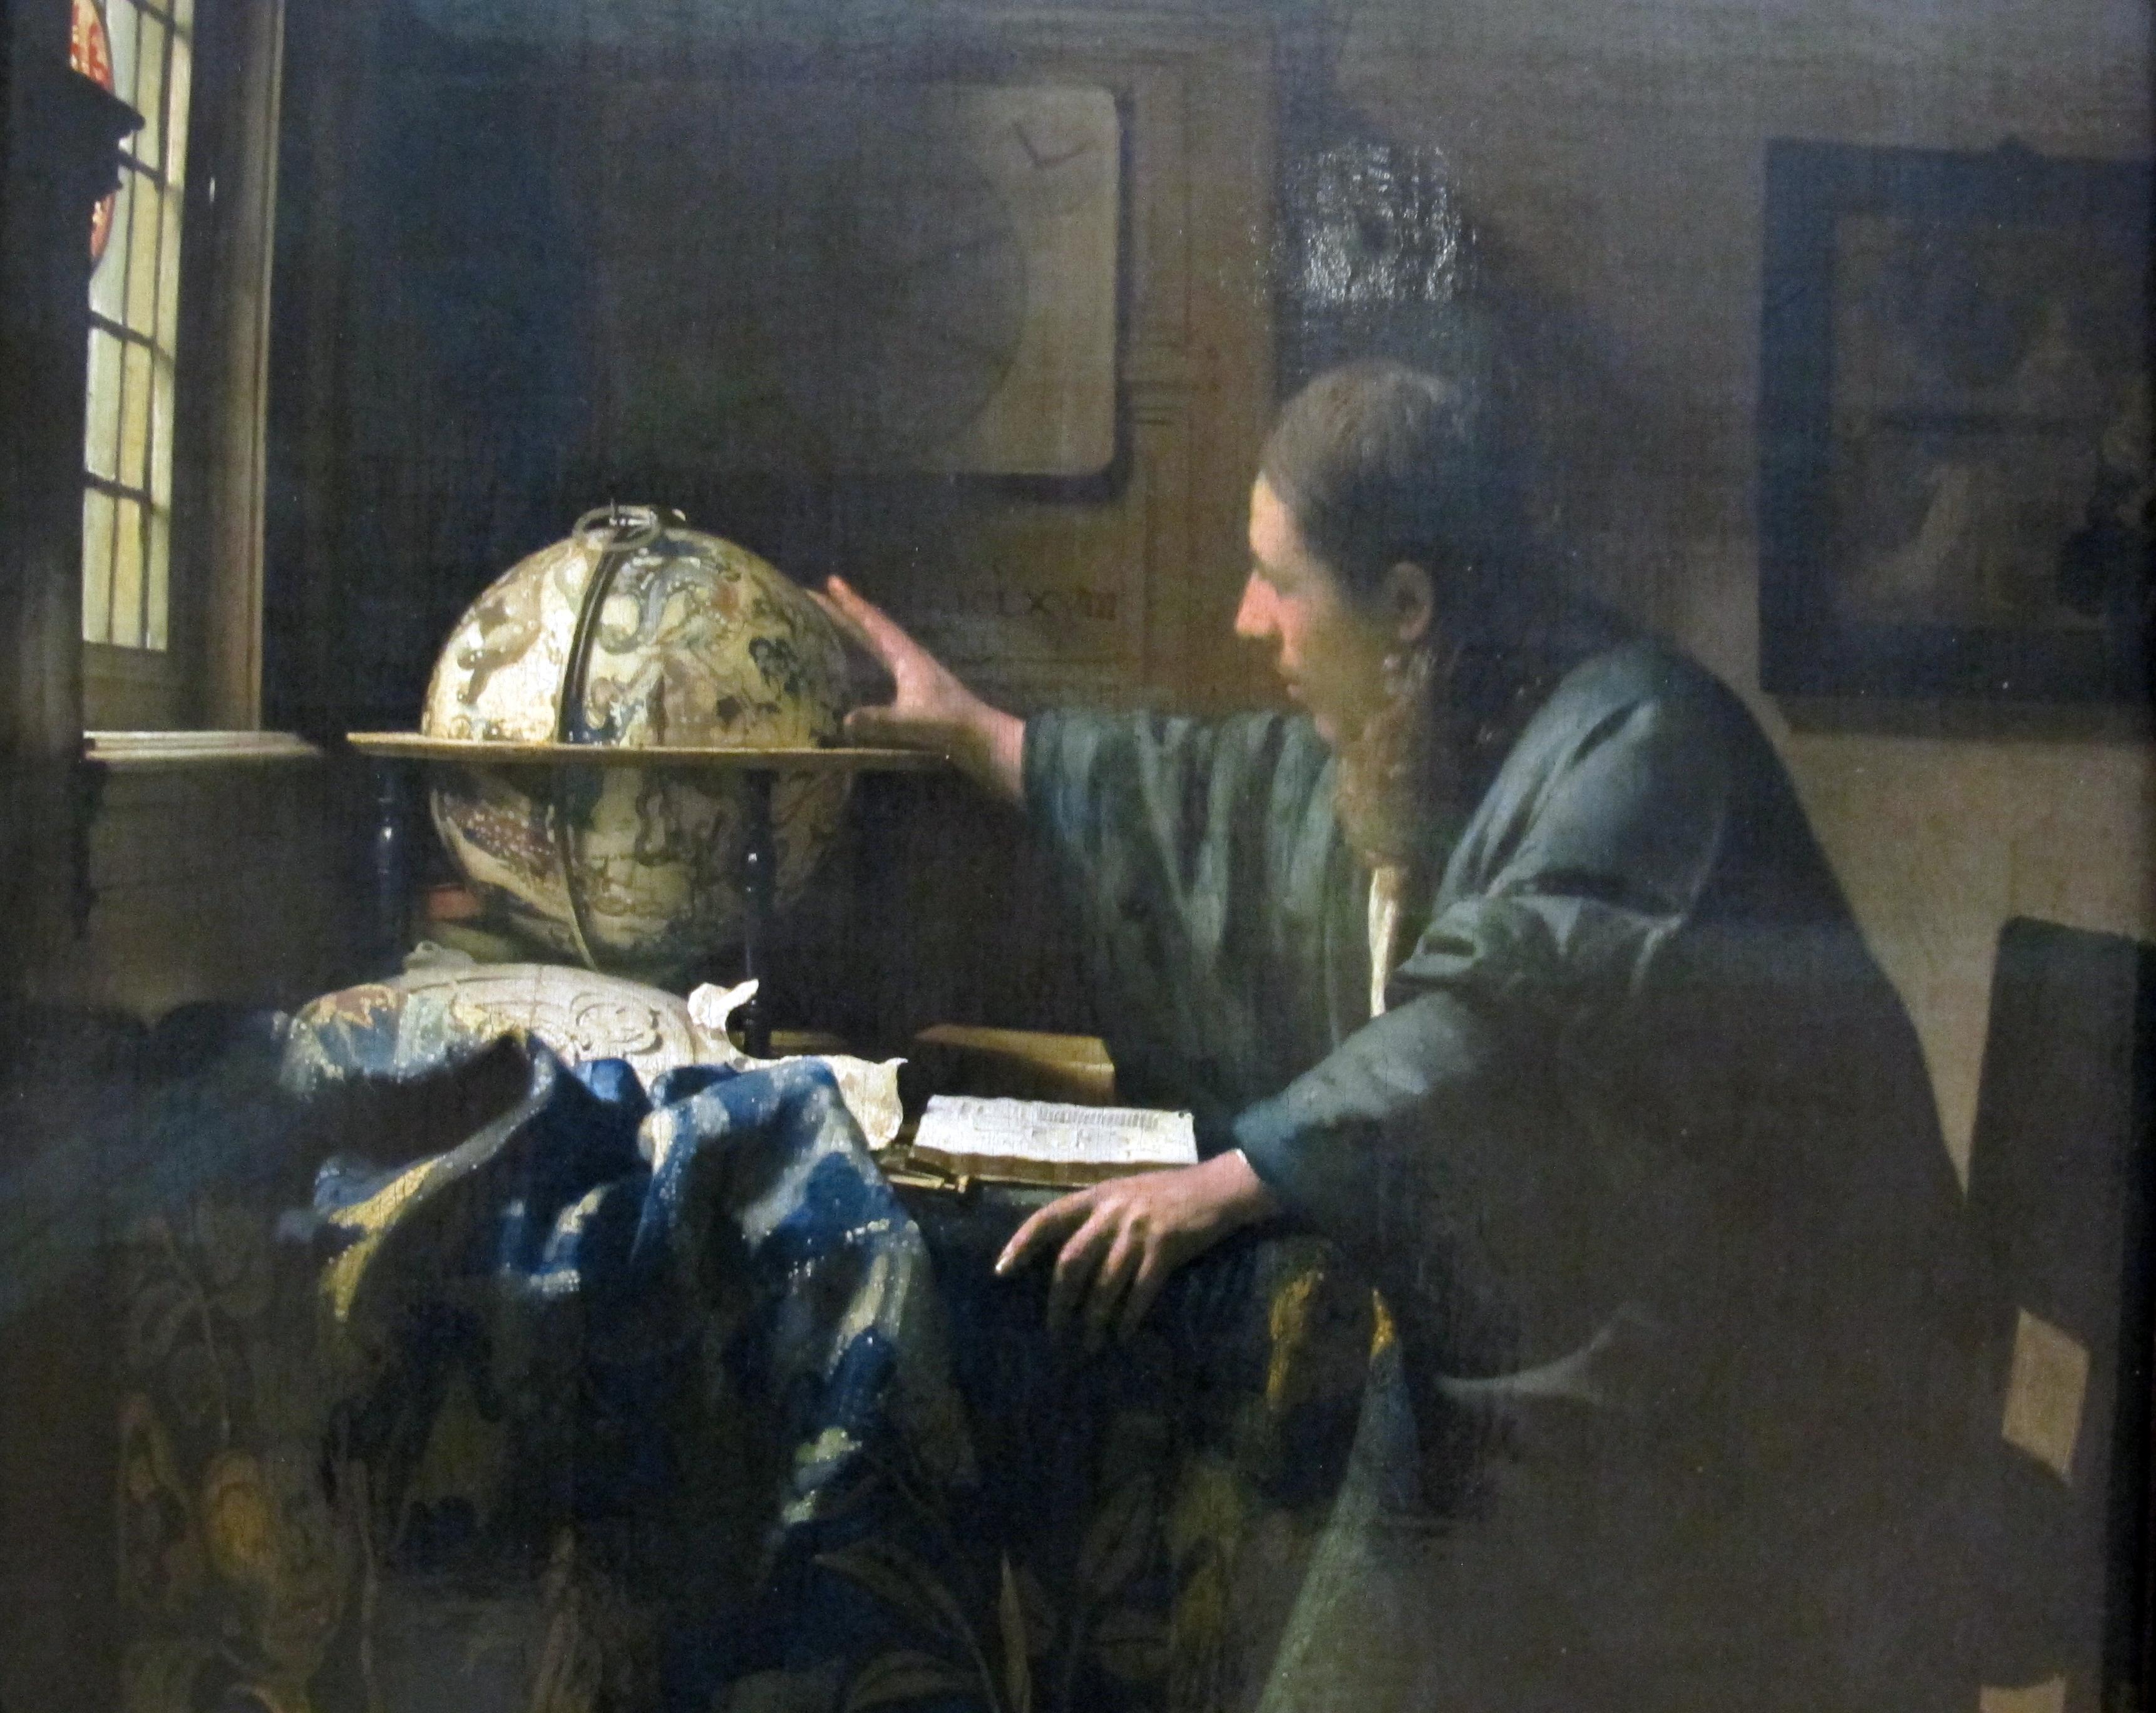 Dealer For The People >> File:Johannes vermeer, l'astronomo, 1668, 02.JPG - Wikimedia Commons